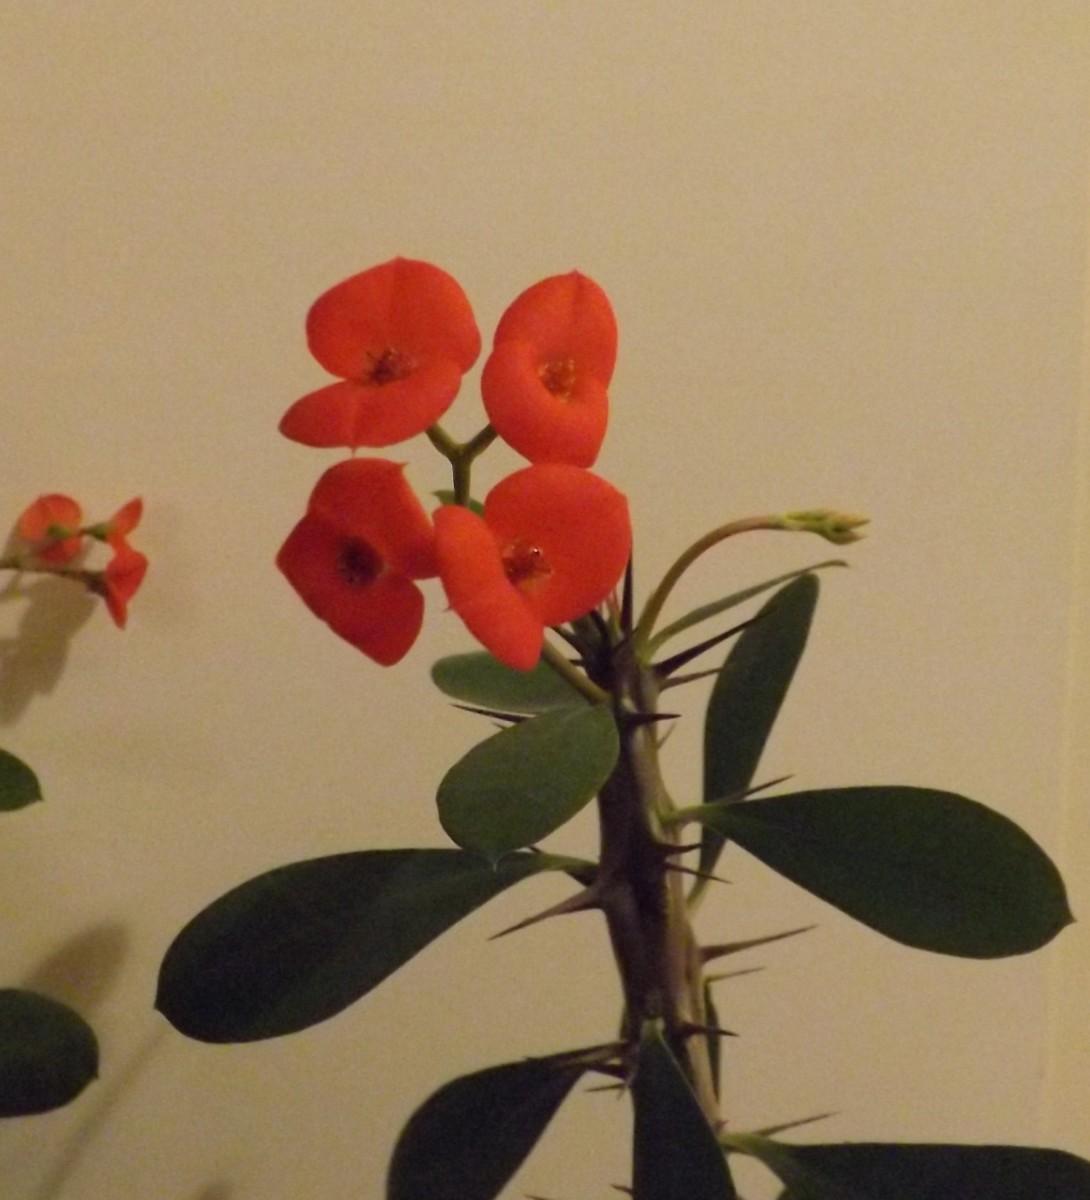 Crown Of Thorns An Interesting Houseplant Dengarden